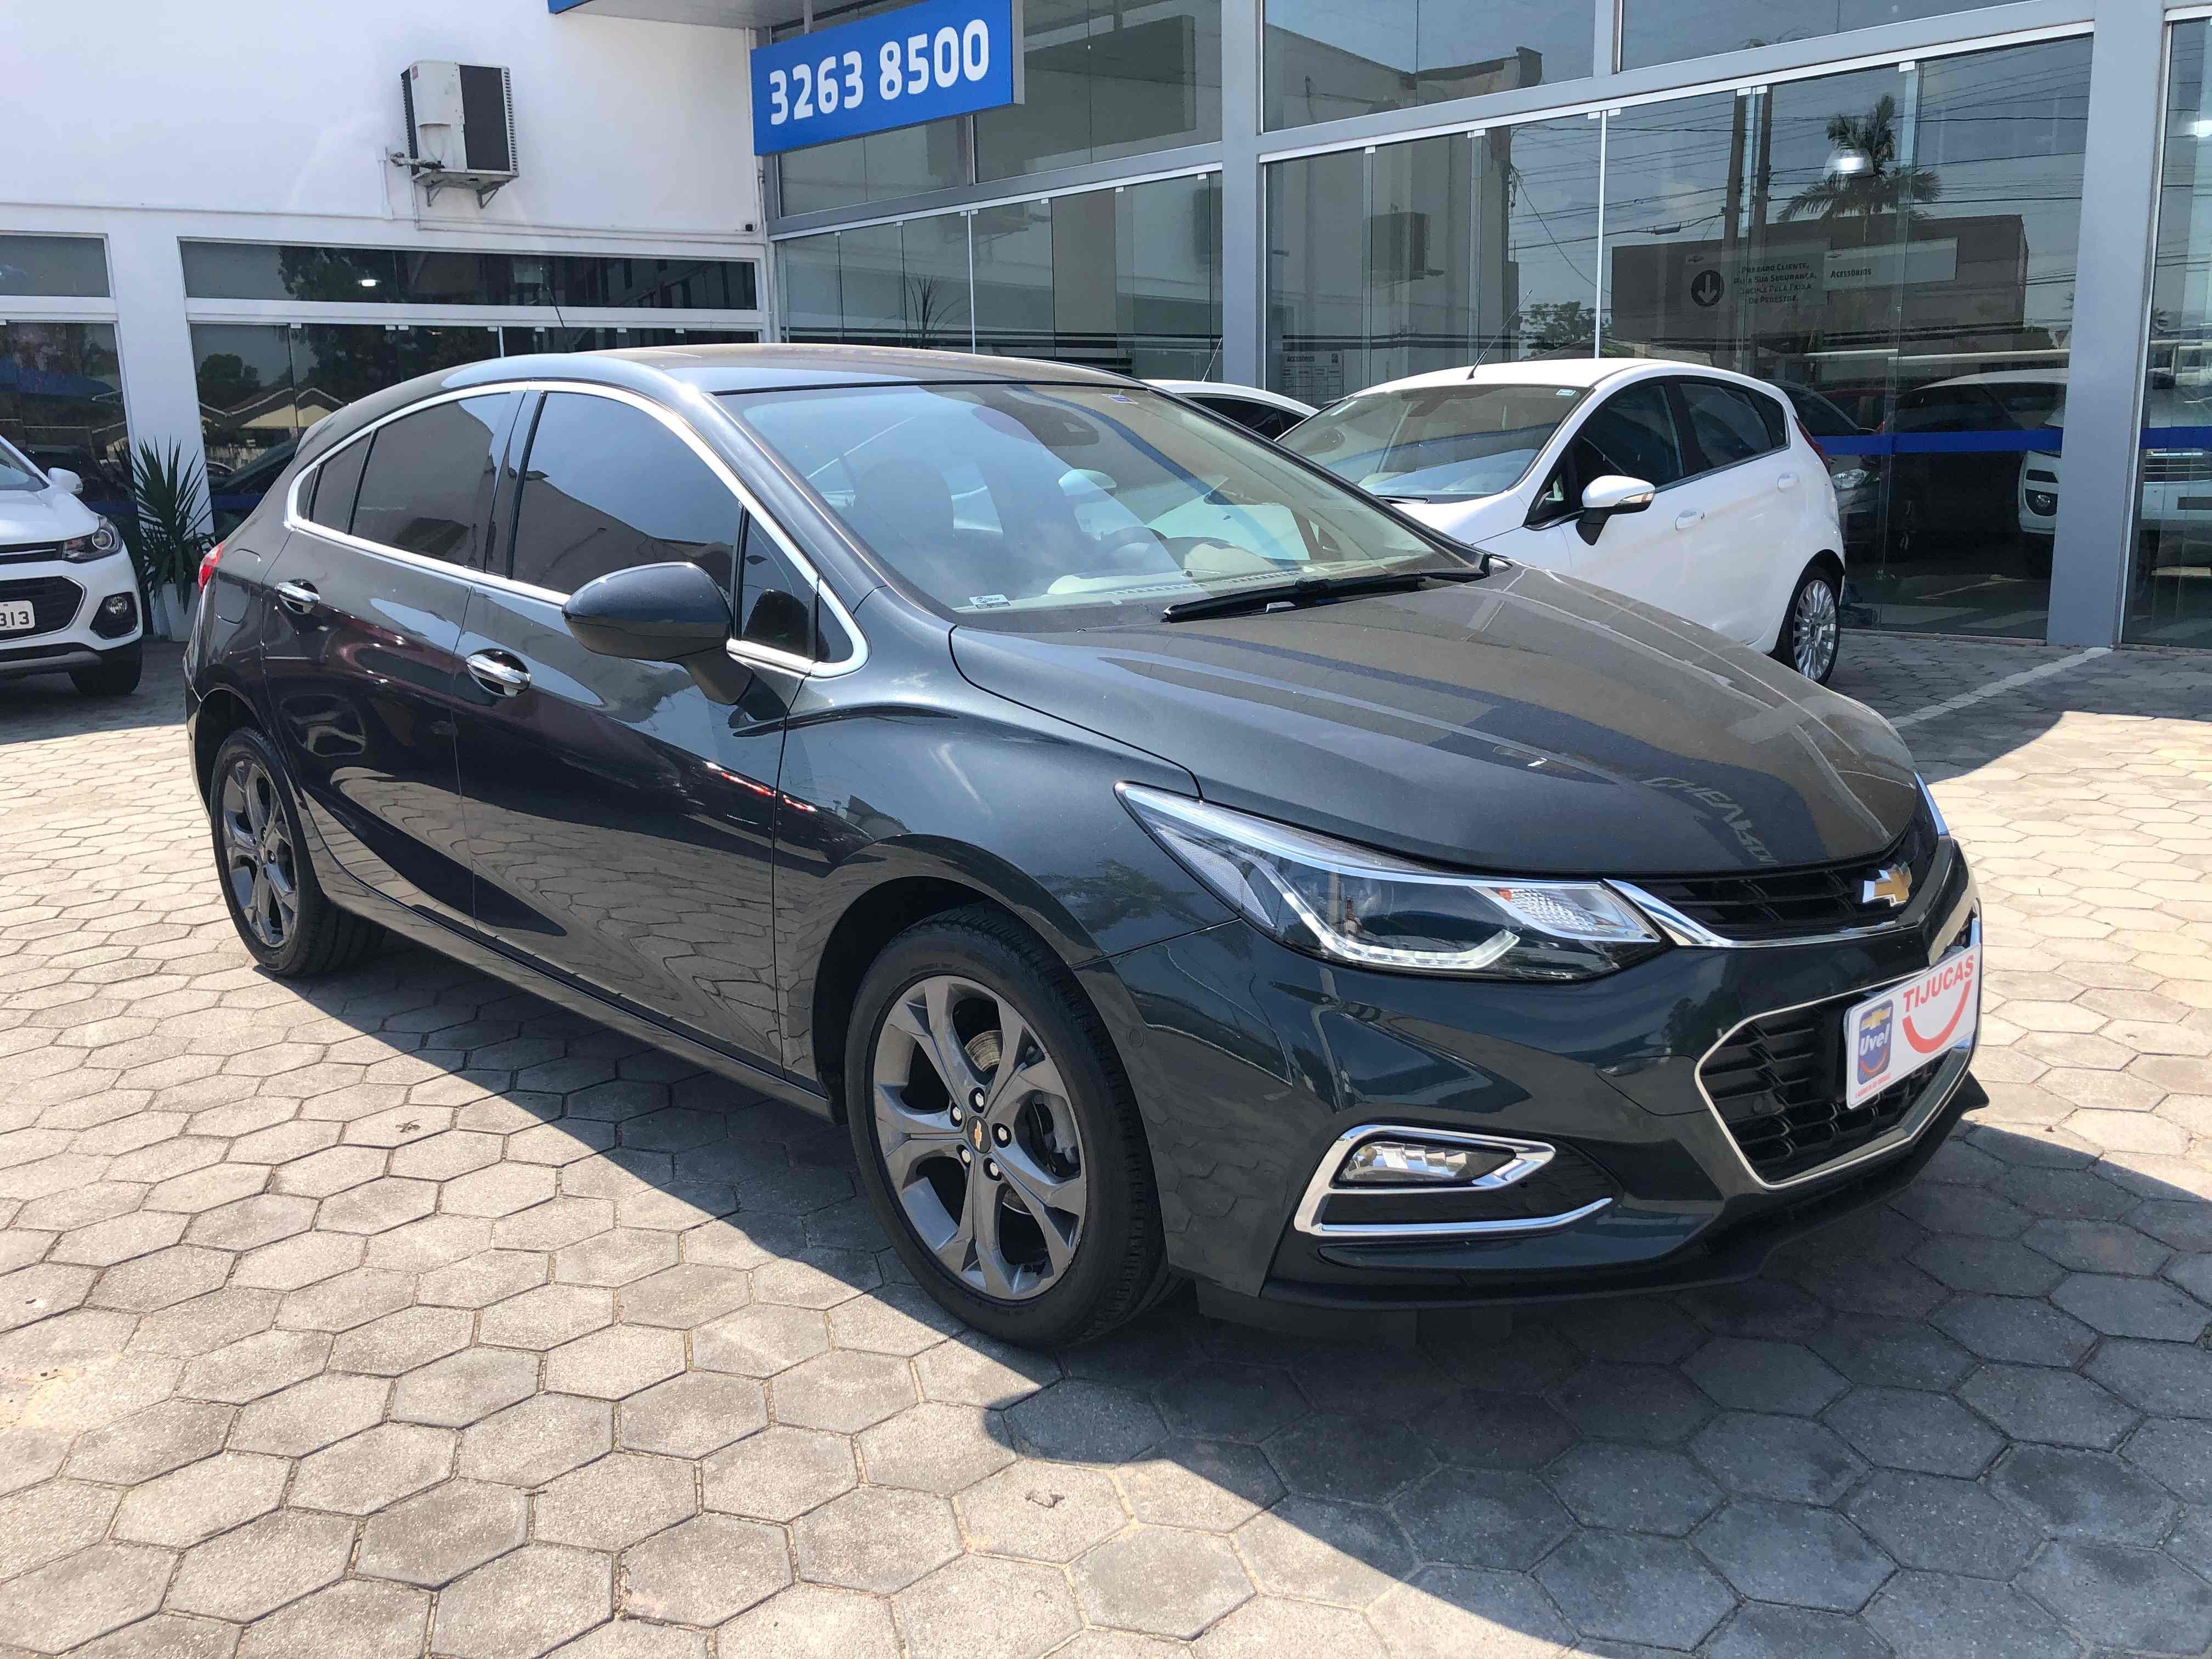 Chevrolet Cruze LTZ 1.4L 2017